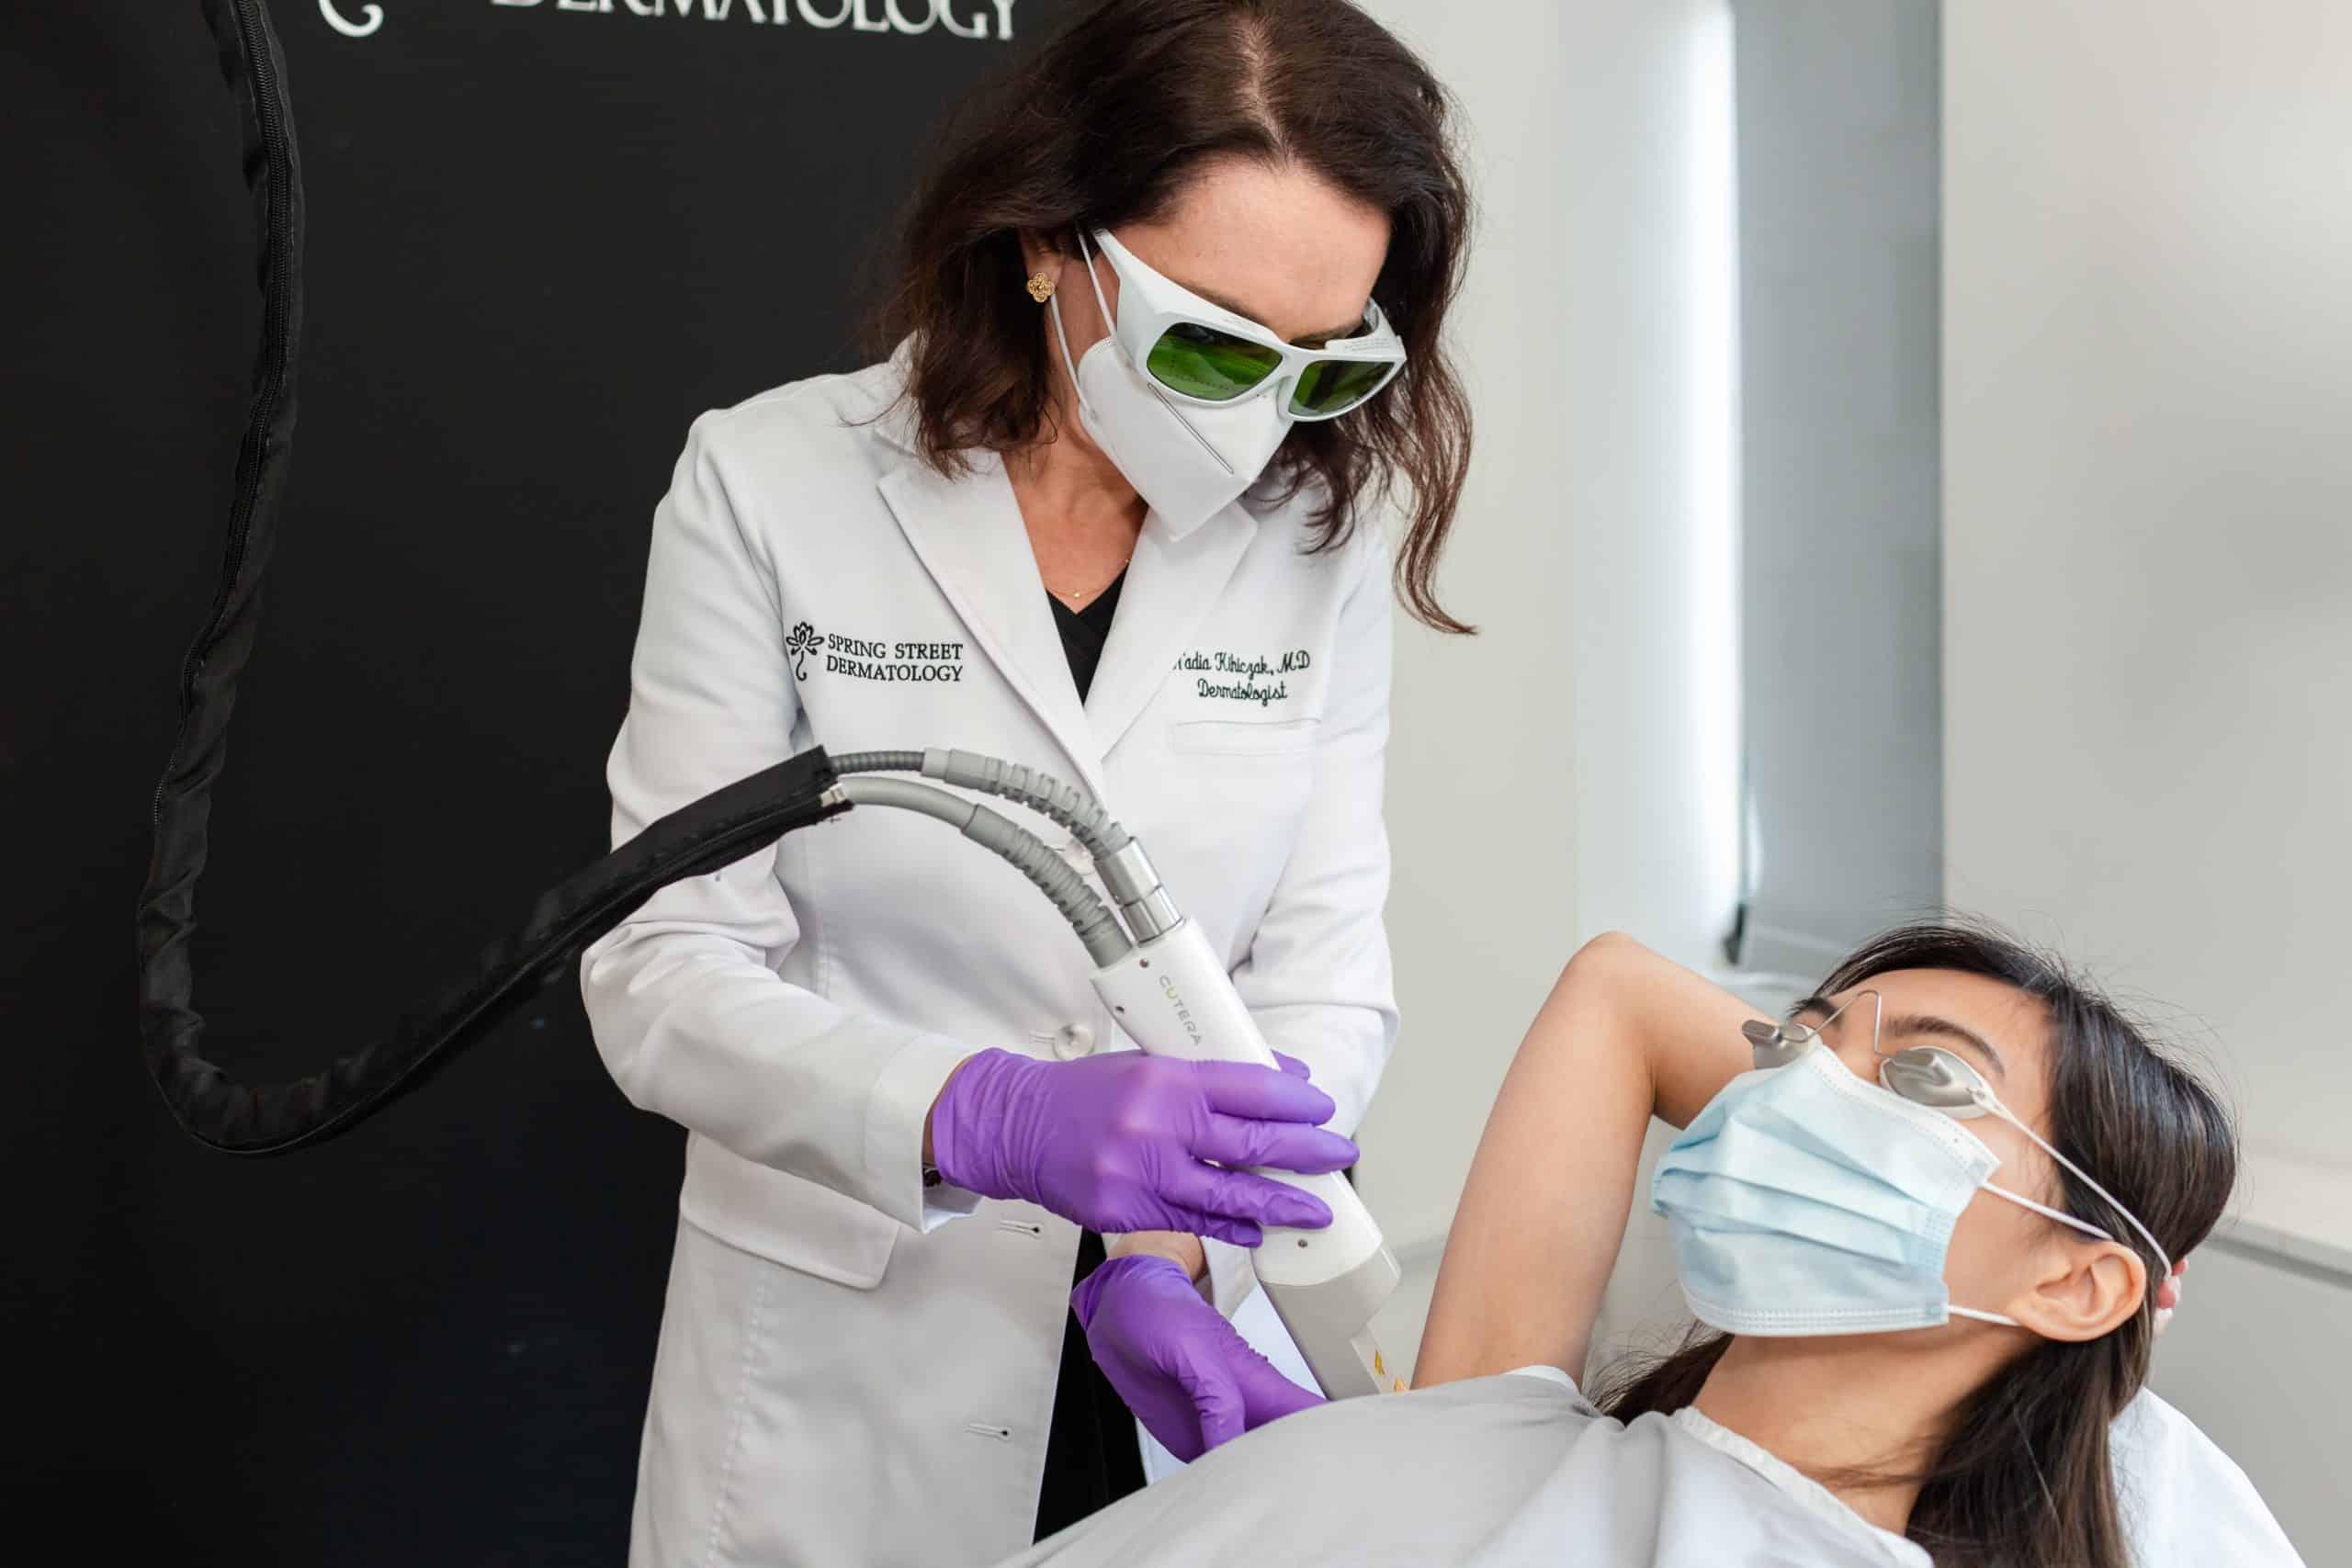 Laser Genesis at Spring Street Dermatology in New York City